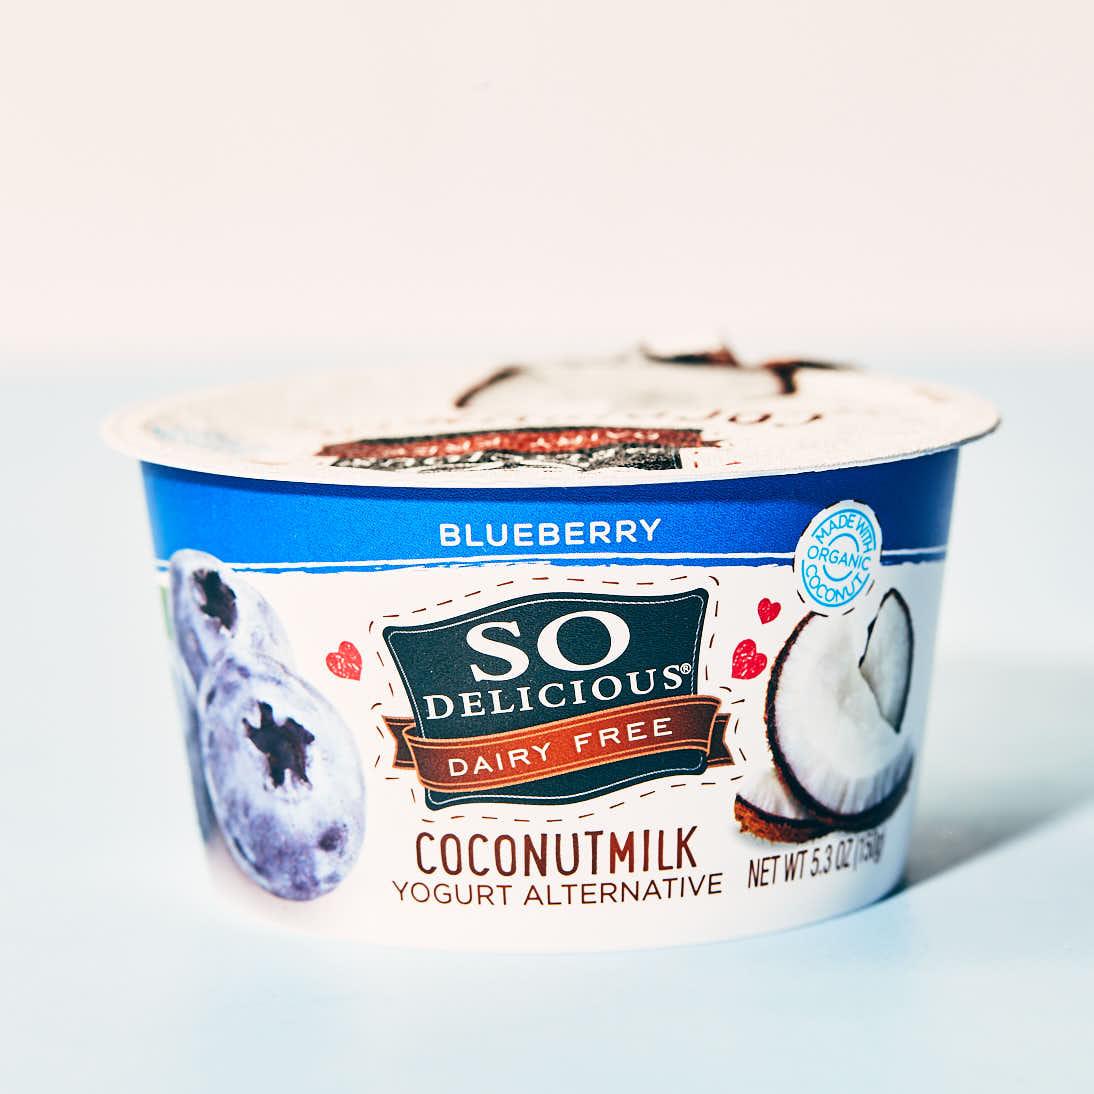 So Delicious Coconut Milk - Blueberry.jpg